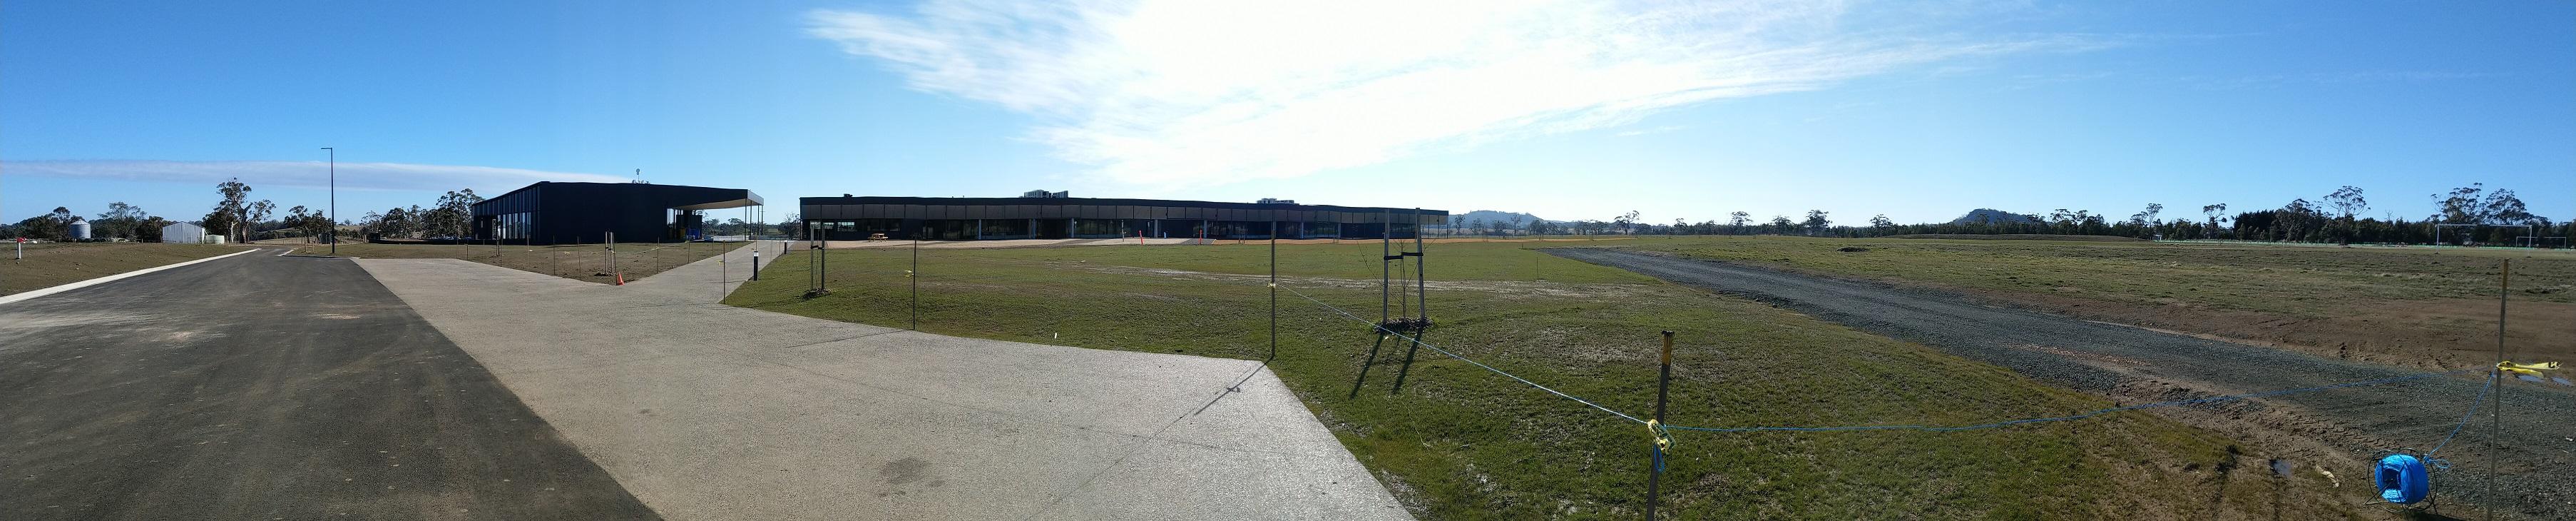 Braemar College, Woodend